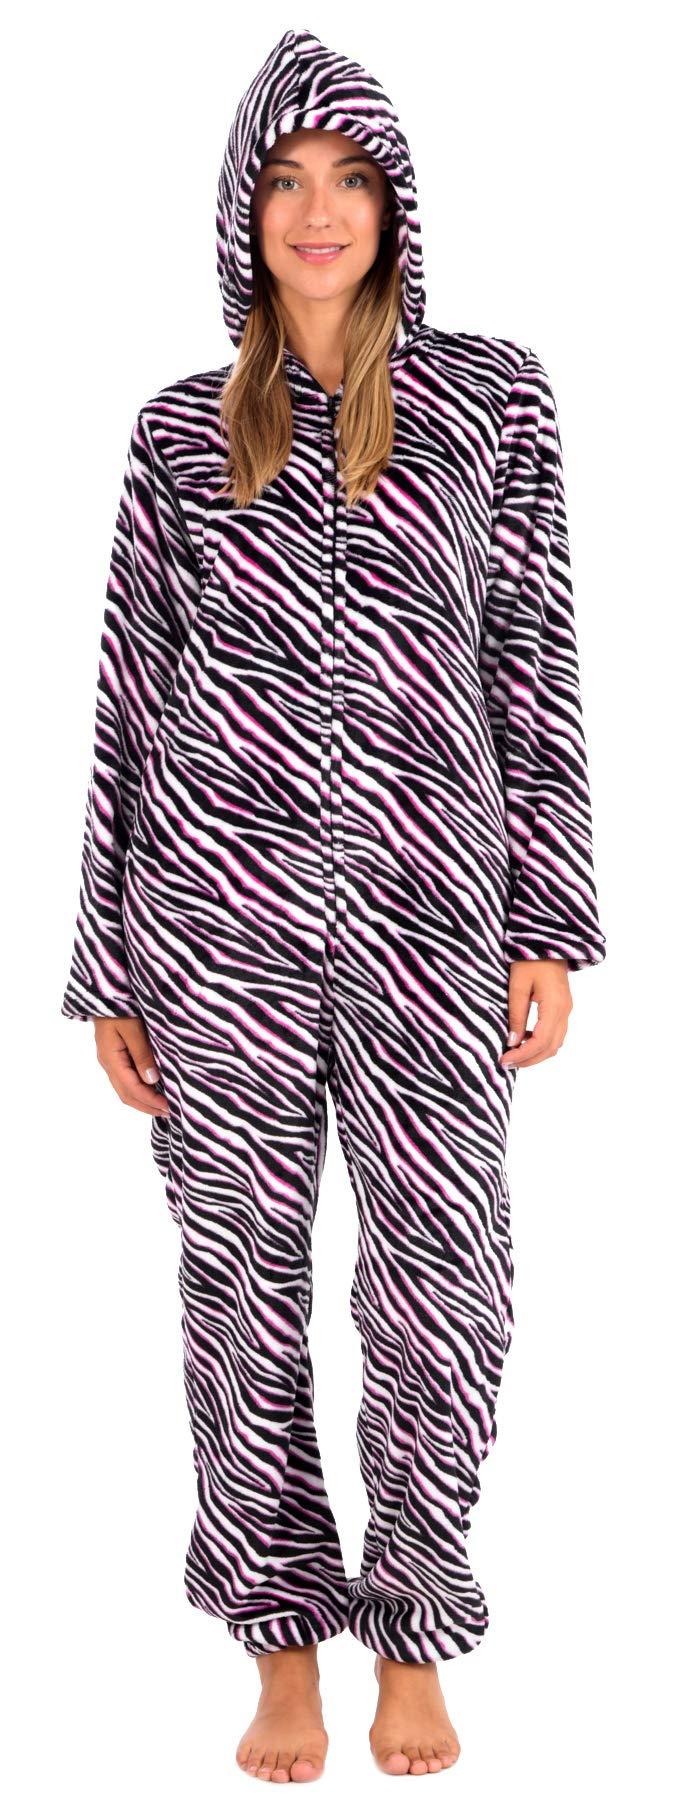 Body Candy Women's Plush Adult Animal Hood Onesie Pajama (Pink Zebra, Small) by Body Candy Loungewear